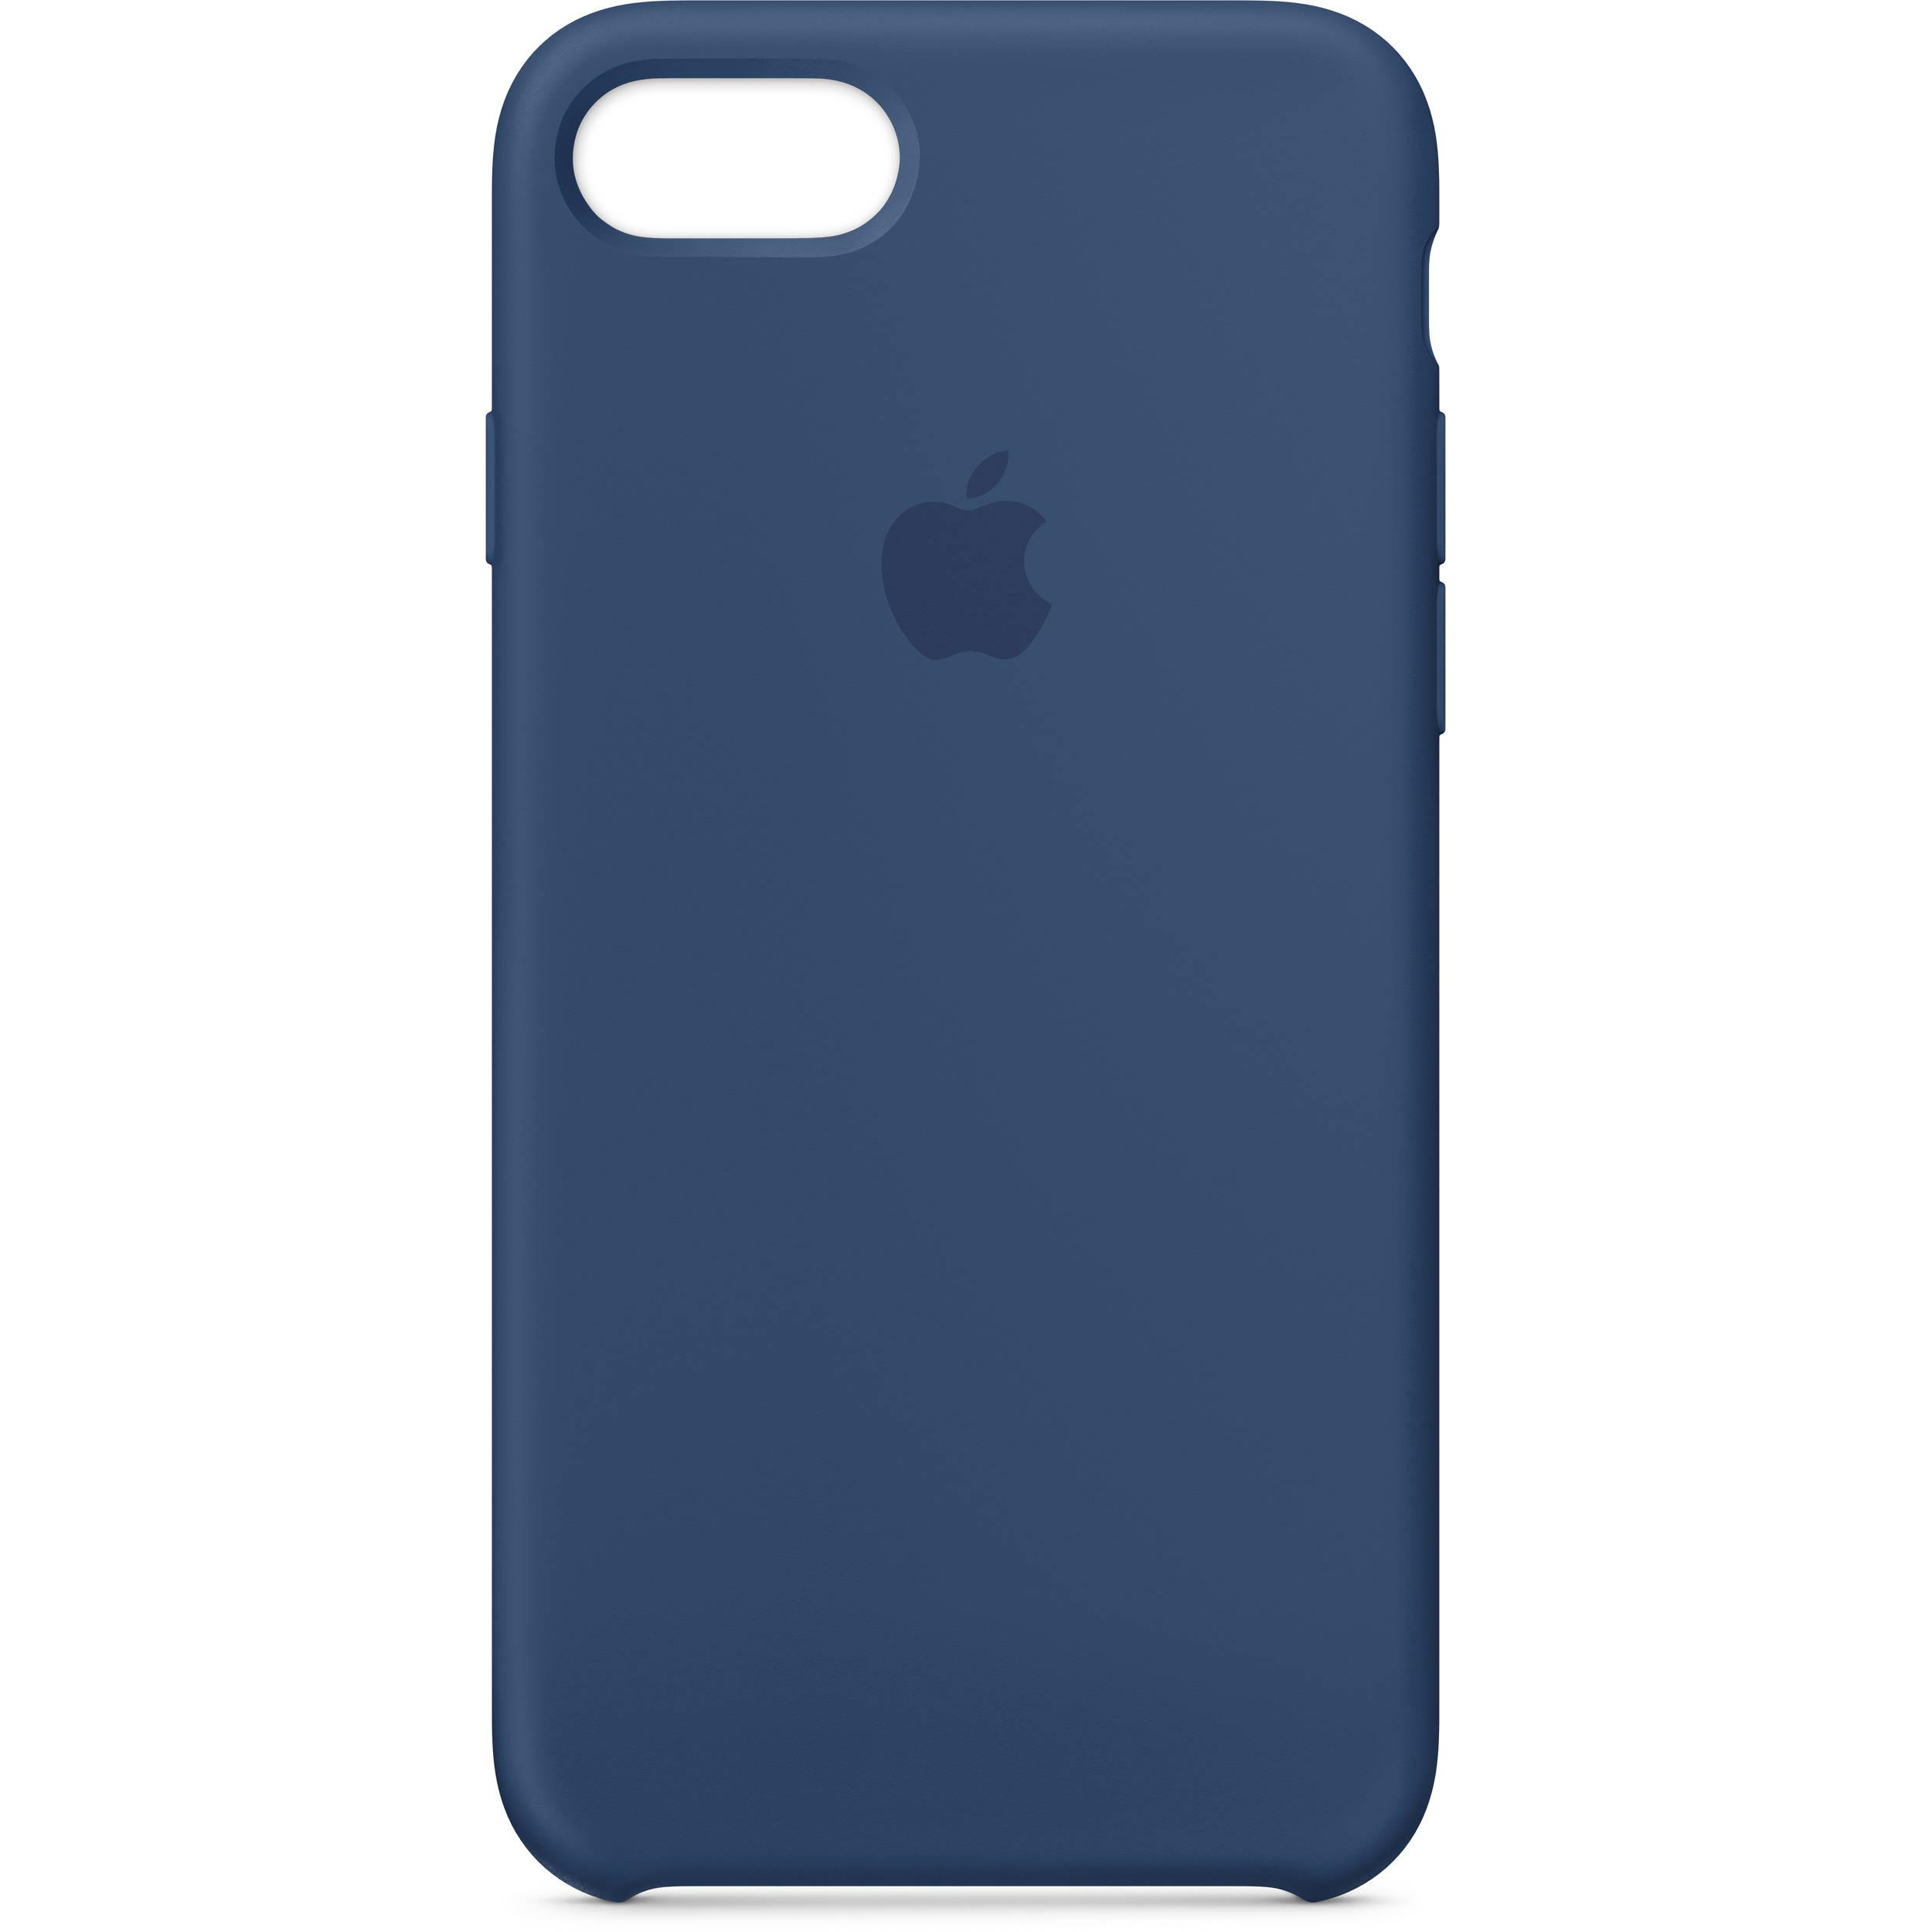 designer fashion 409a0 80bb5 Apple iPhone 7/8 Silicone Case (Blue Cobalt)